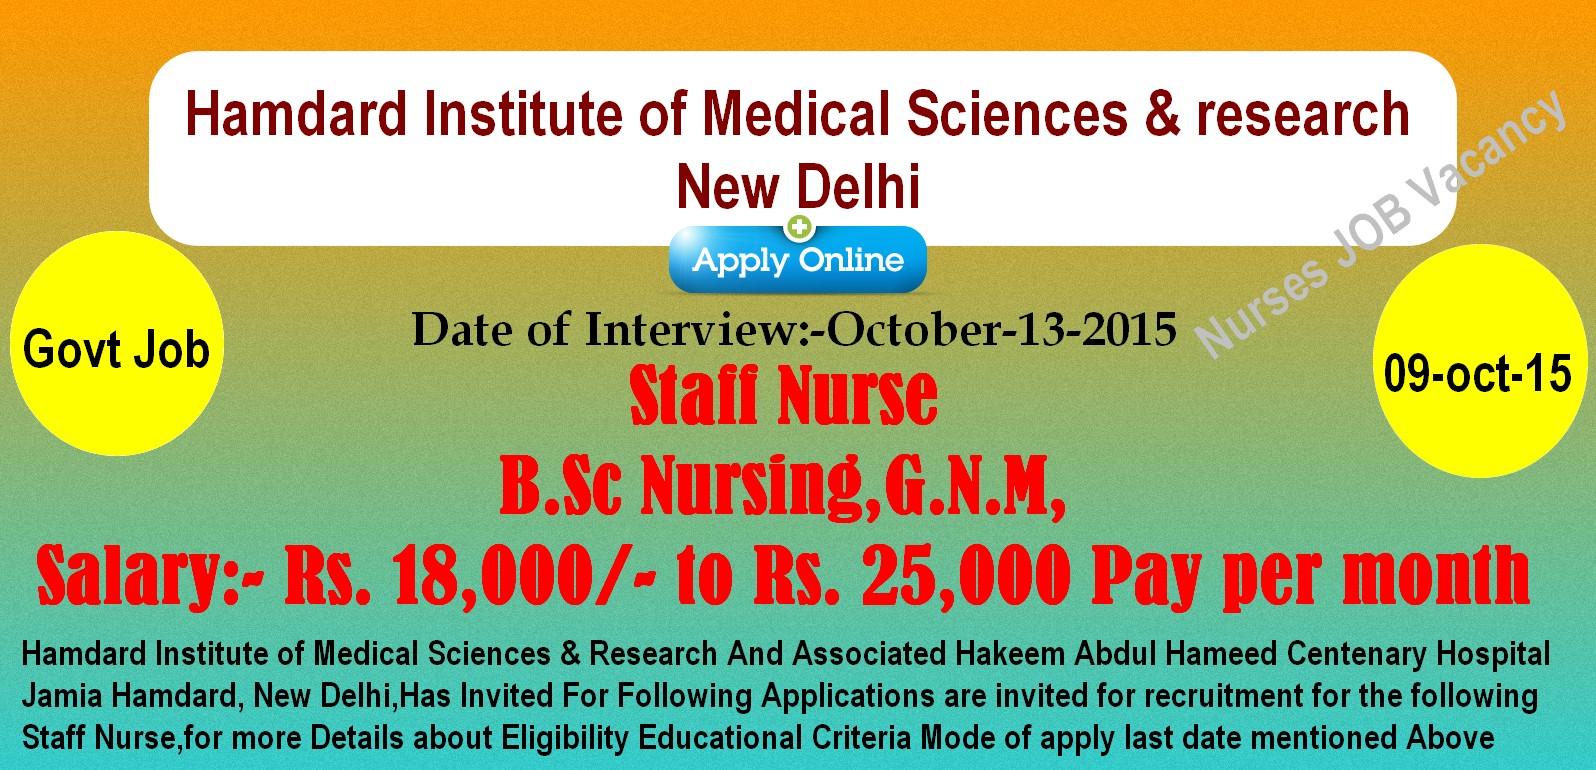 nurses job vacancy govt staff nurse jobs vacancy in hamdard govt staff nurse jobs vacancy in hamdard institute of medical sciences and research new delhi 2015 2016